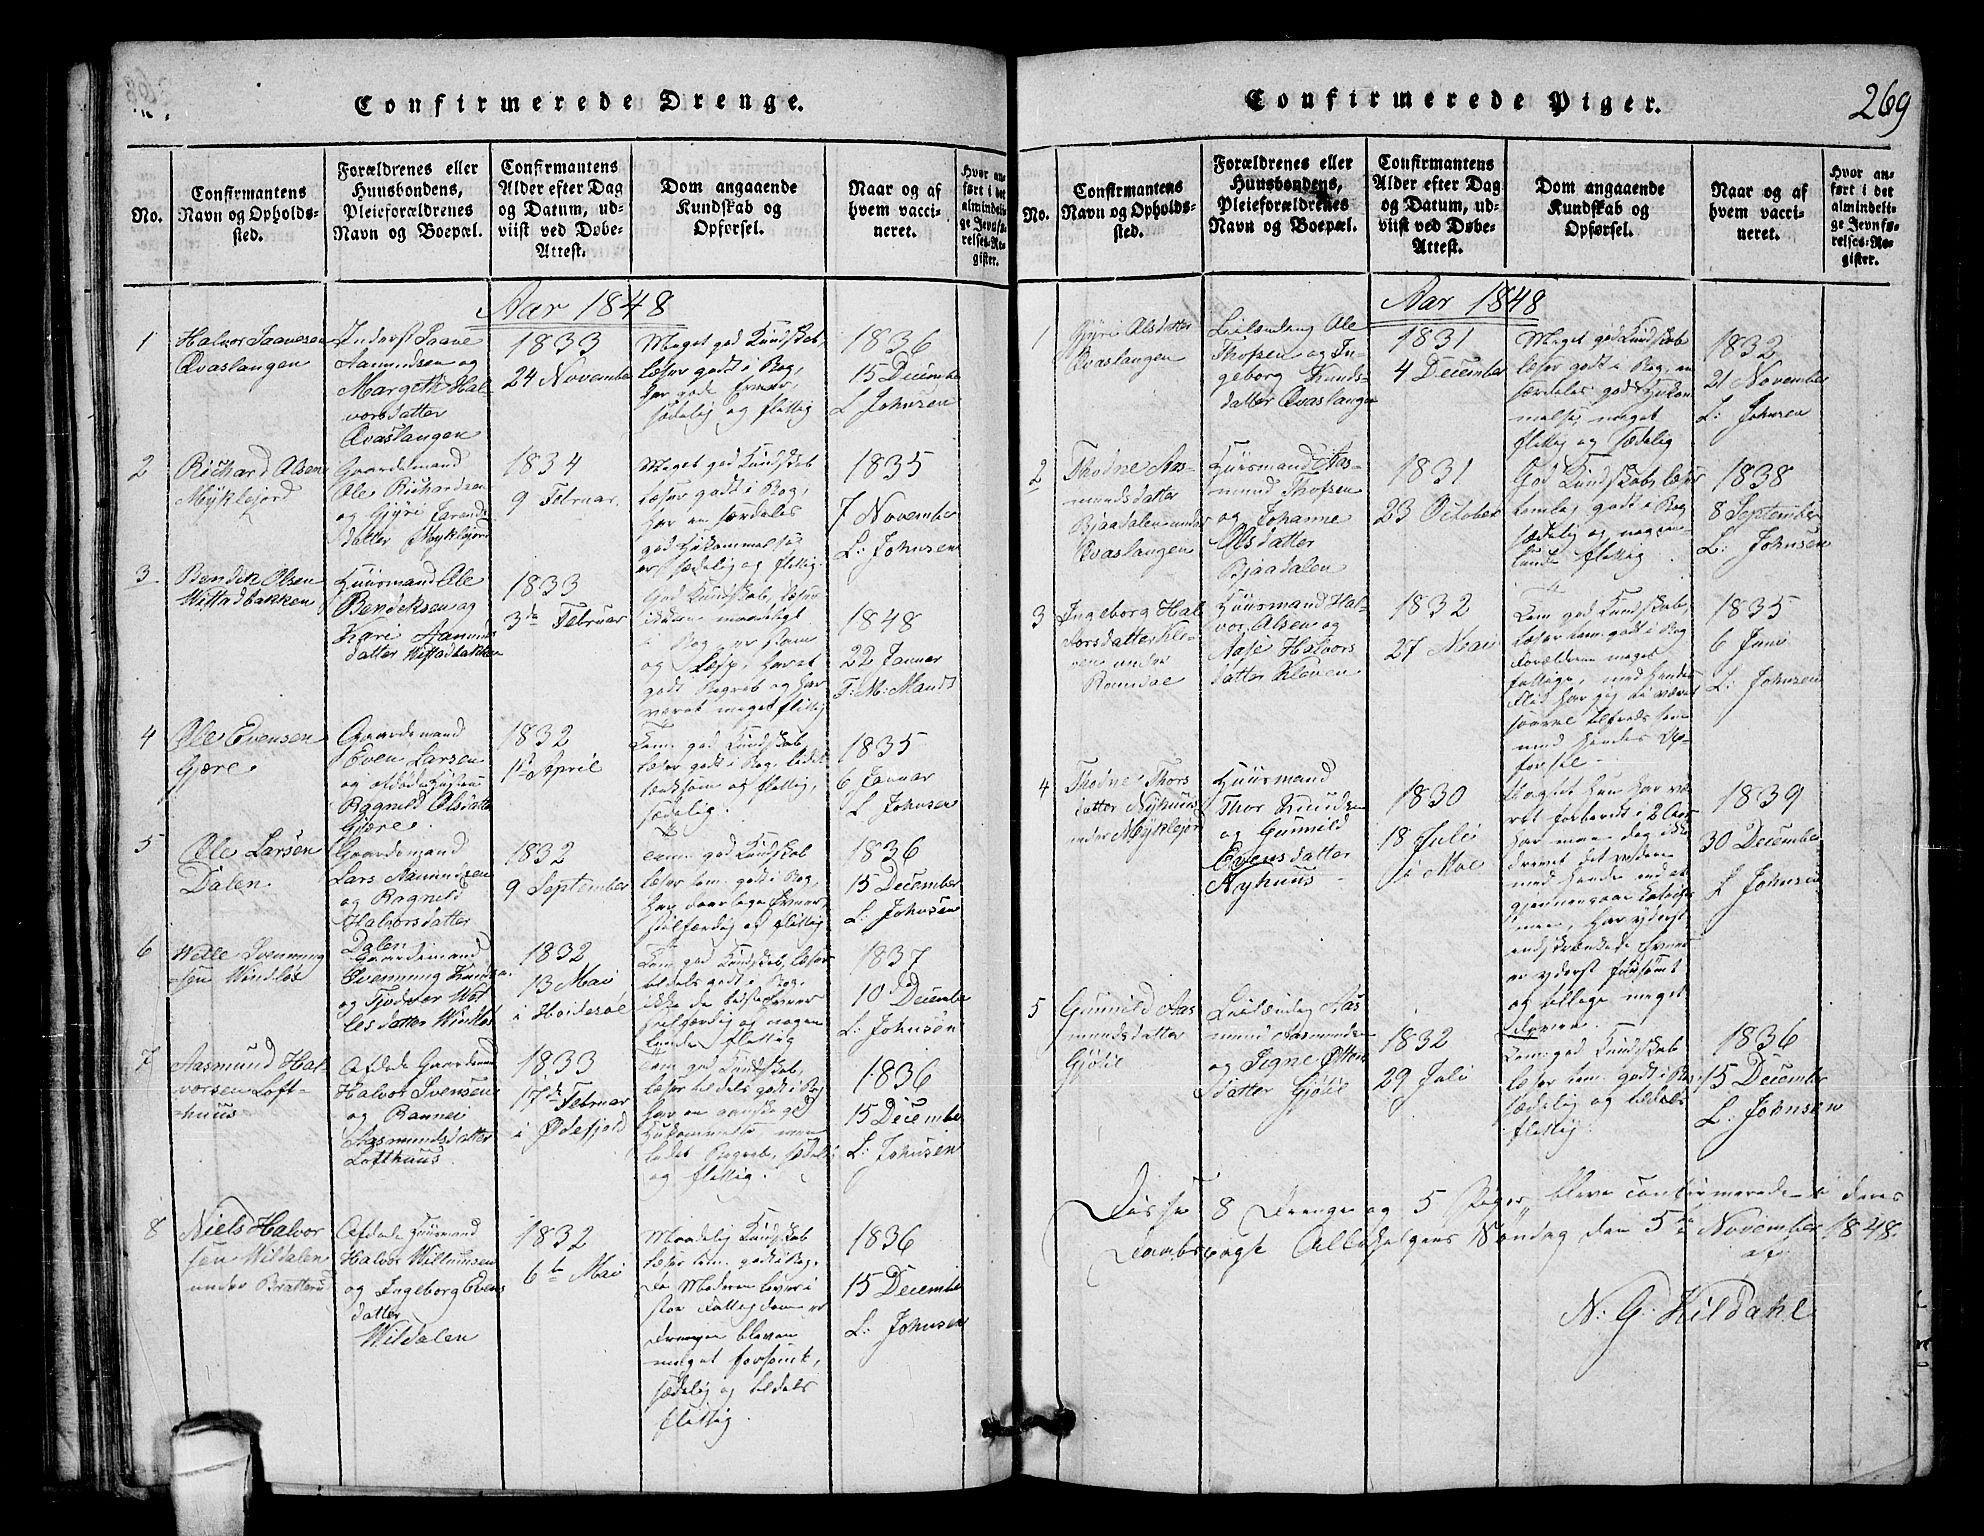 SAKO, Lårdal kirkebøker, G/Gb/L0001: Klokkerbok nr. II 1, 1815-1865, s. 269